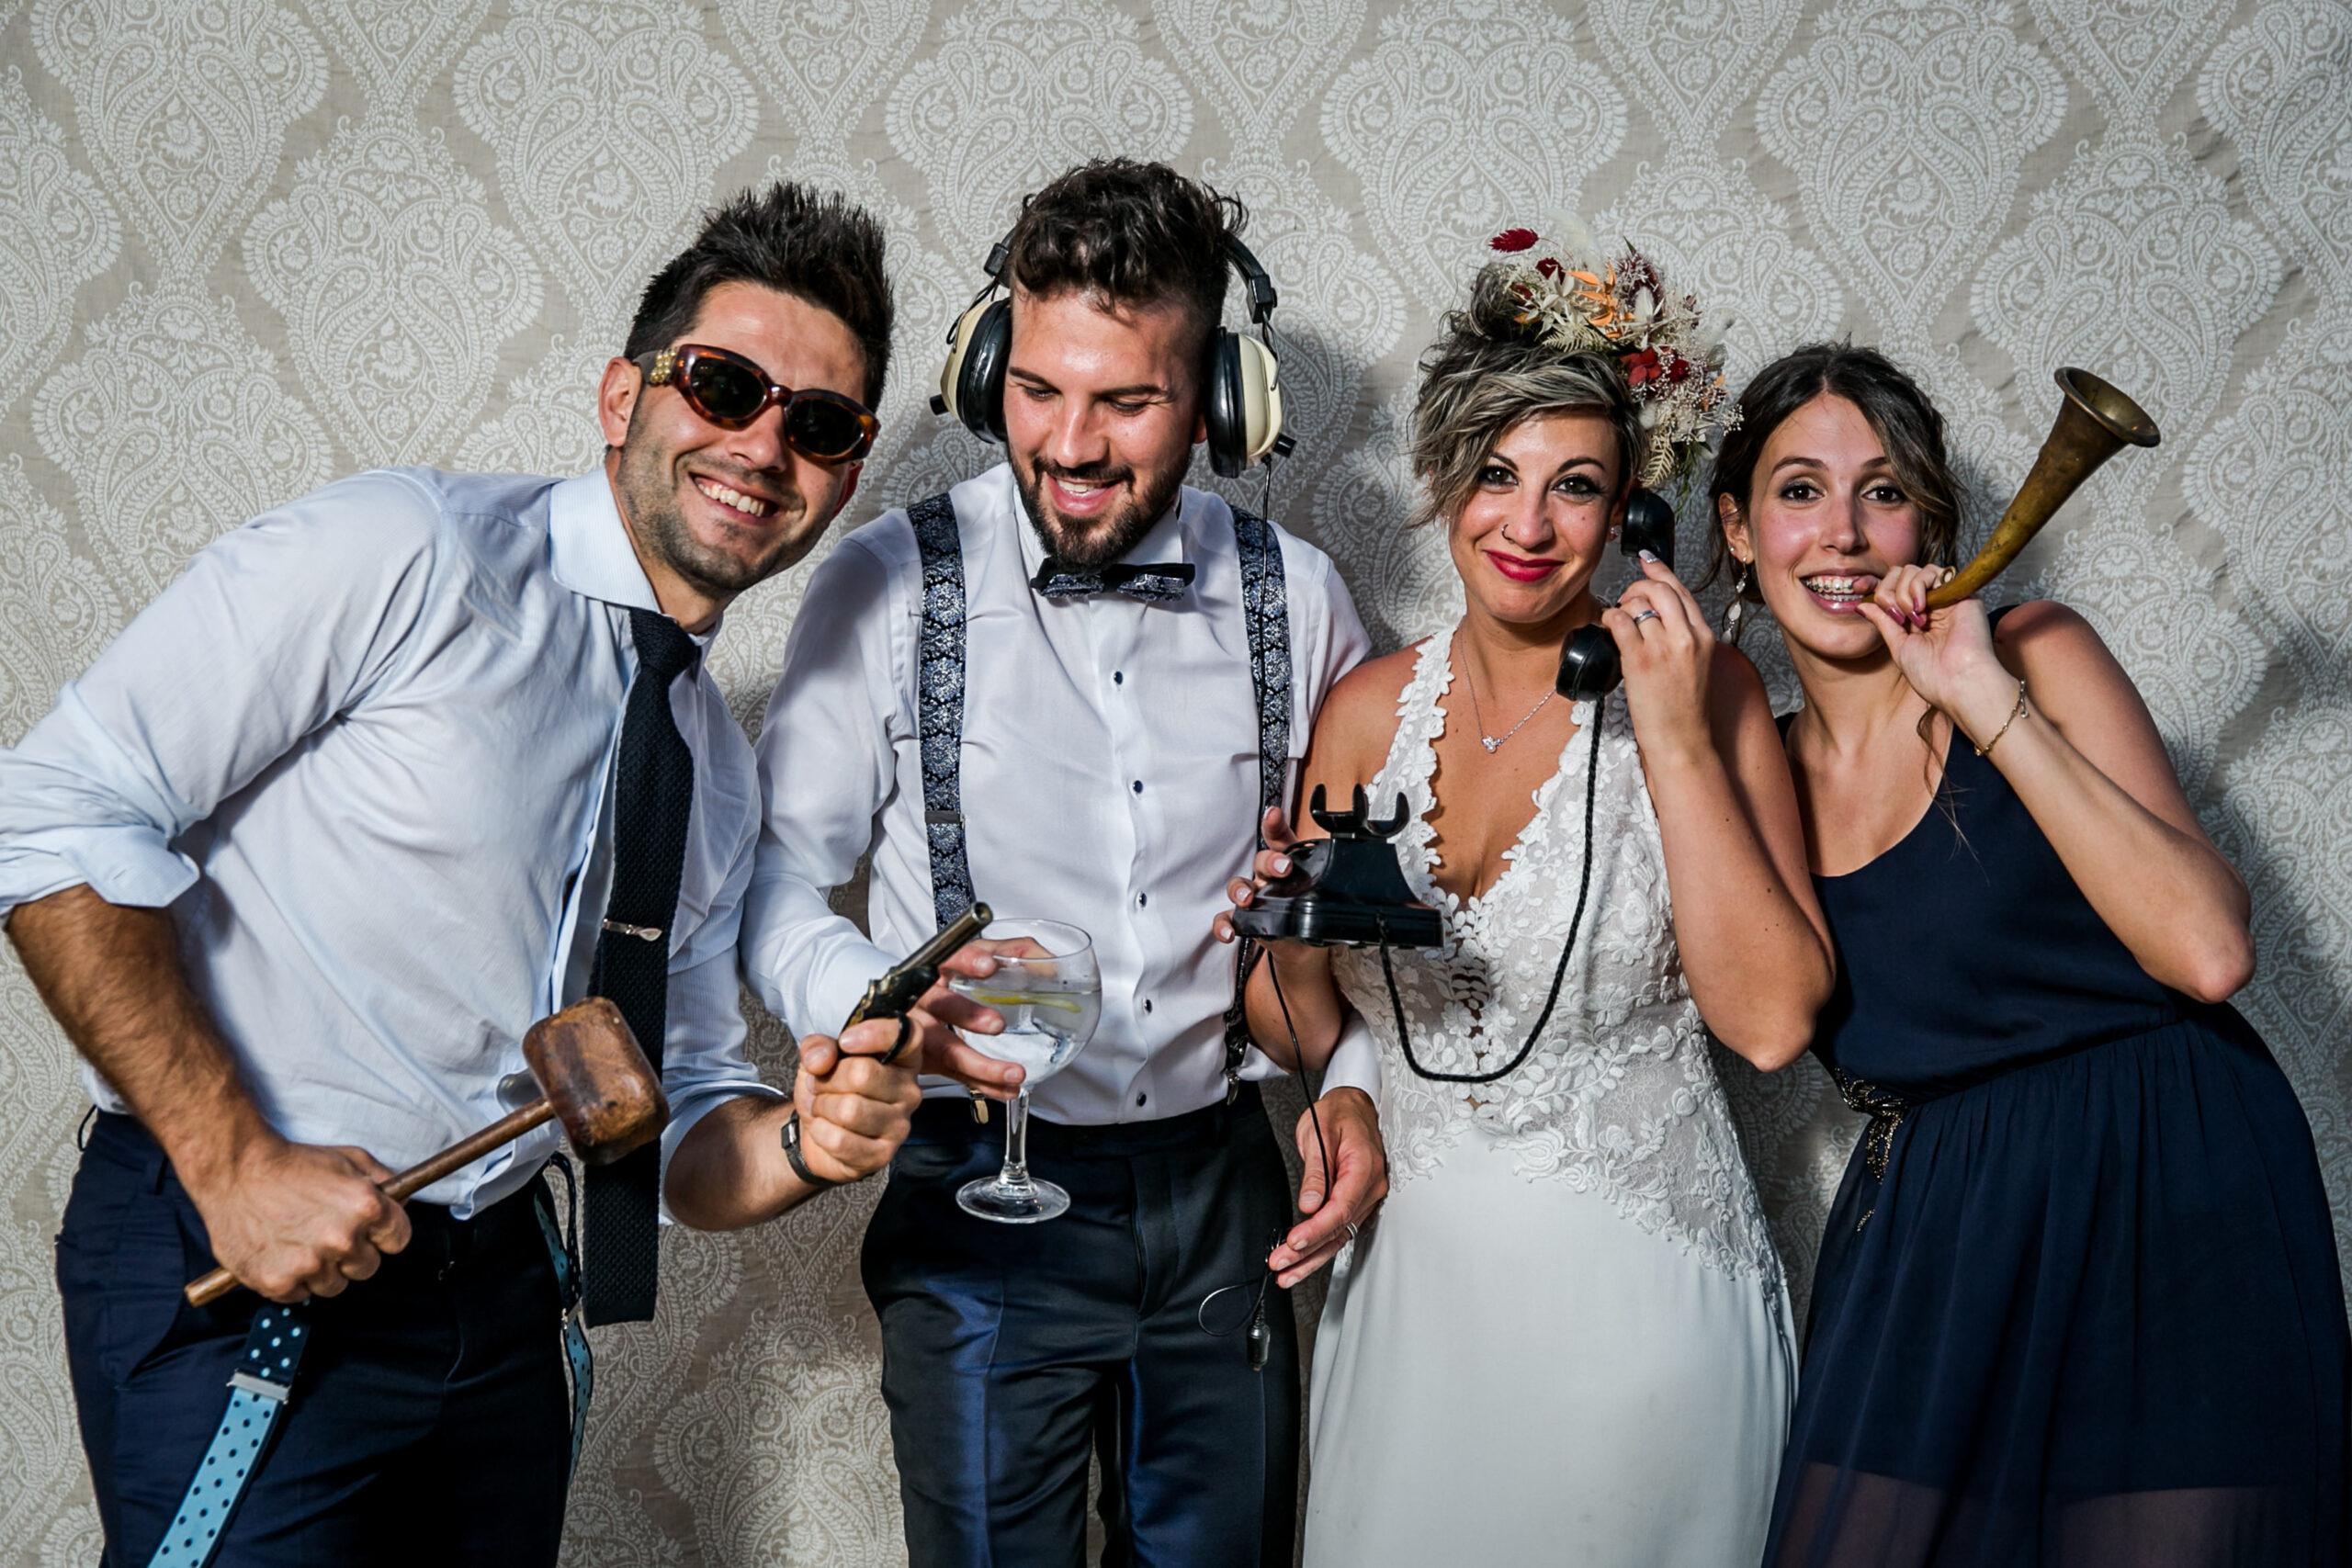 Photocall, photocall Barcelona, Barcelona photocall, photobooth, fotocall, Barcelona fotocall, fotocallbarcelona, eventos, fiestas, boda, weddings, wedding inspiration, fun, awesome, happy, Barcelona eventos, Barcelona events, organización de eventos, photocall eventos, fotógrafo eventos, fotógrafo bodas,